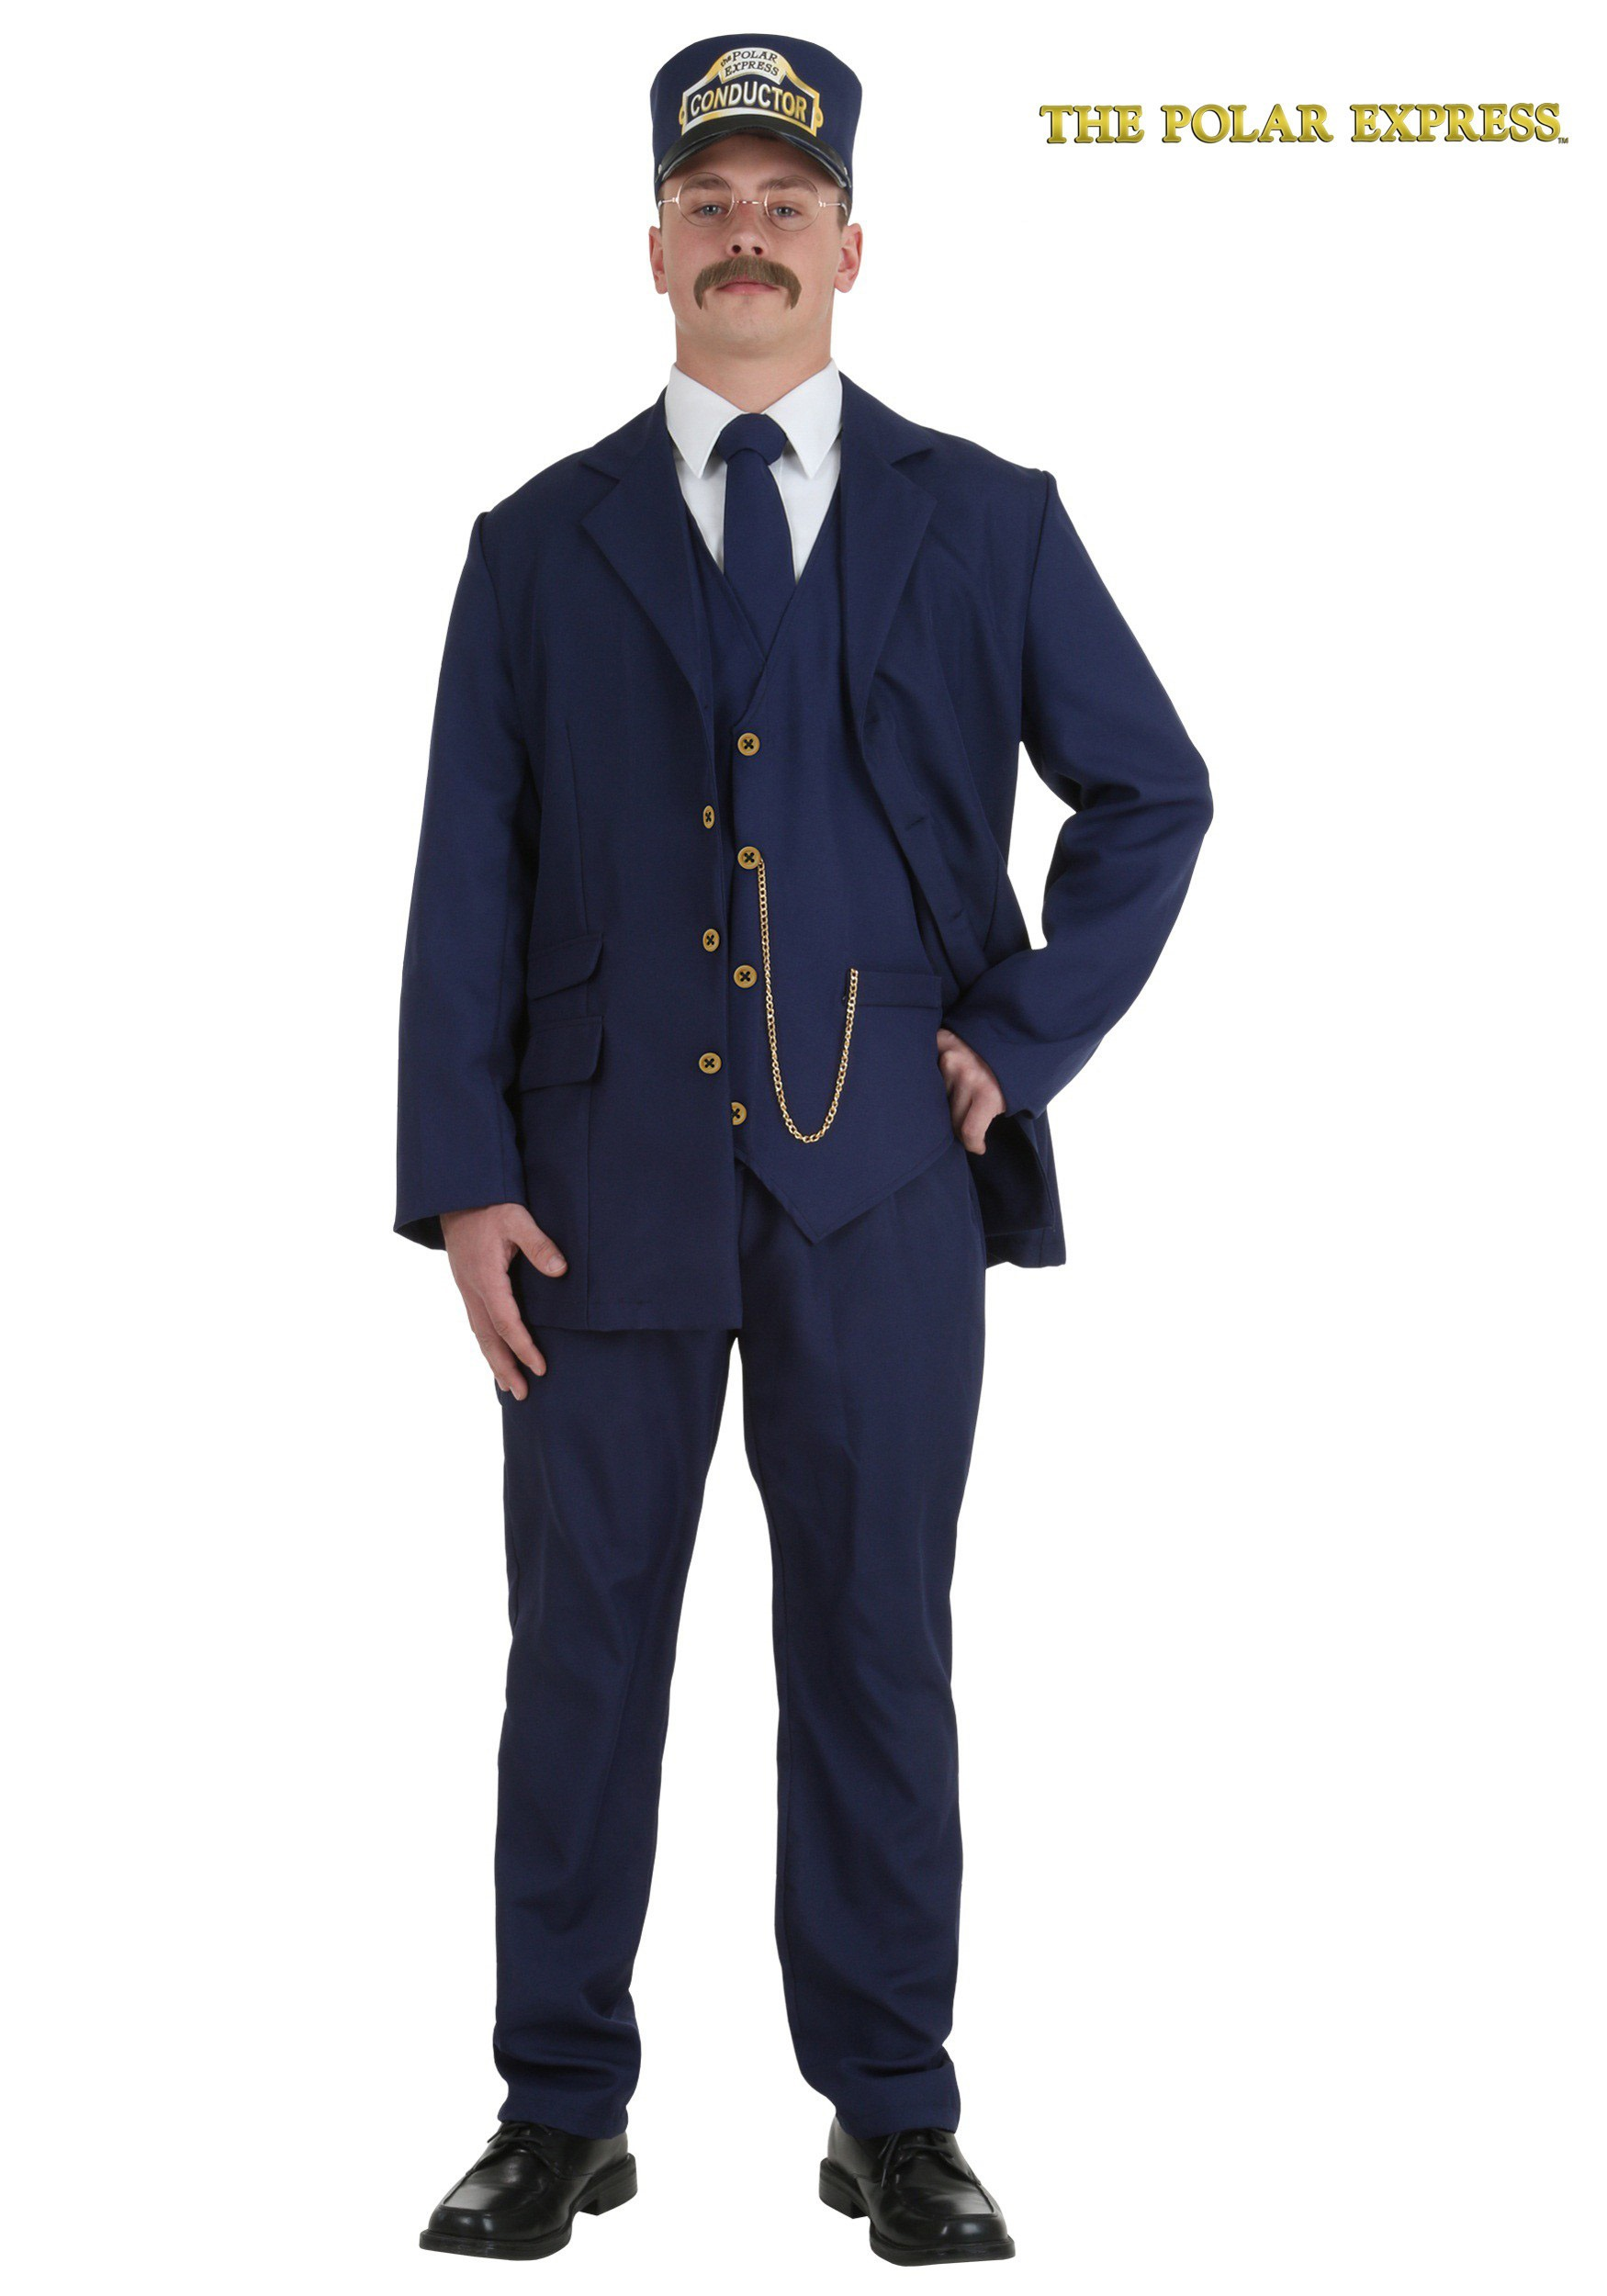 sc 1 st  Walmart & Adult Polar Express Conductor Costume - Walmart.com